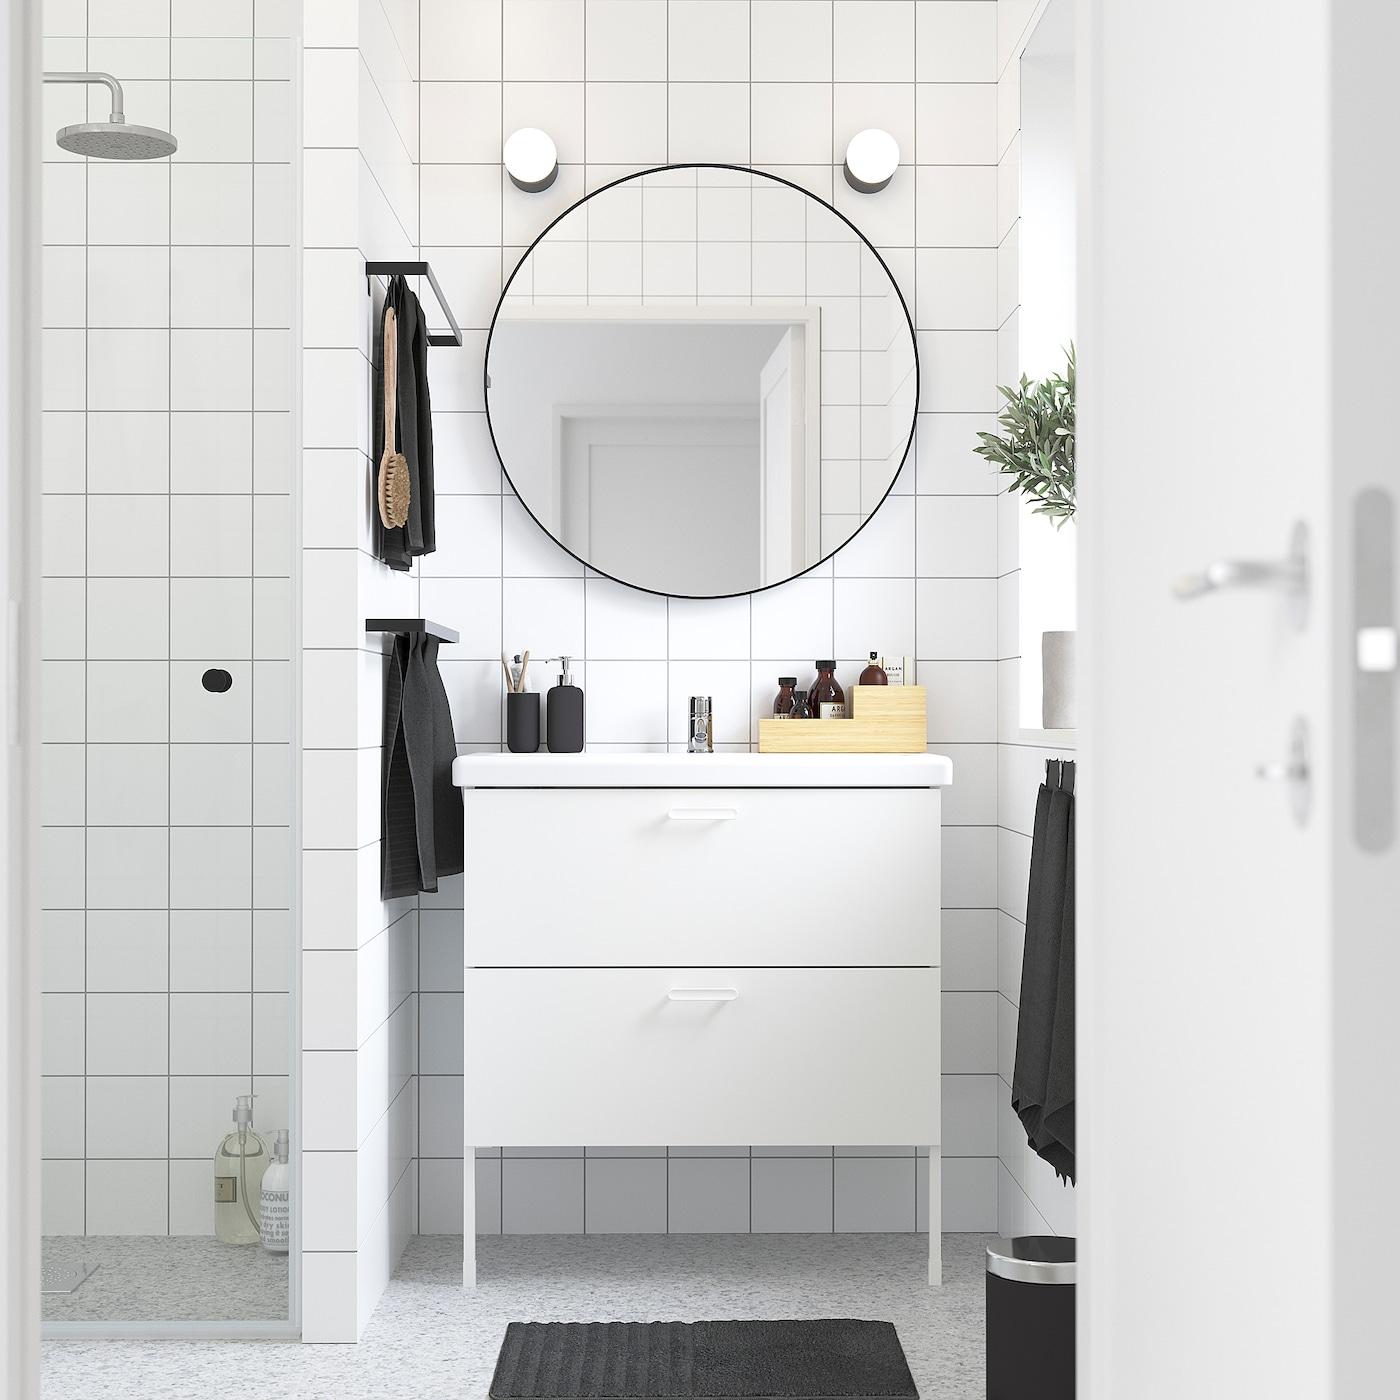 ENHET / TVÄLLEN Wash-stand with 2 drawers, white/Pilkån tap, 84x43x87 cm